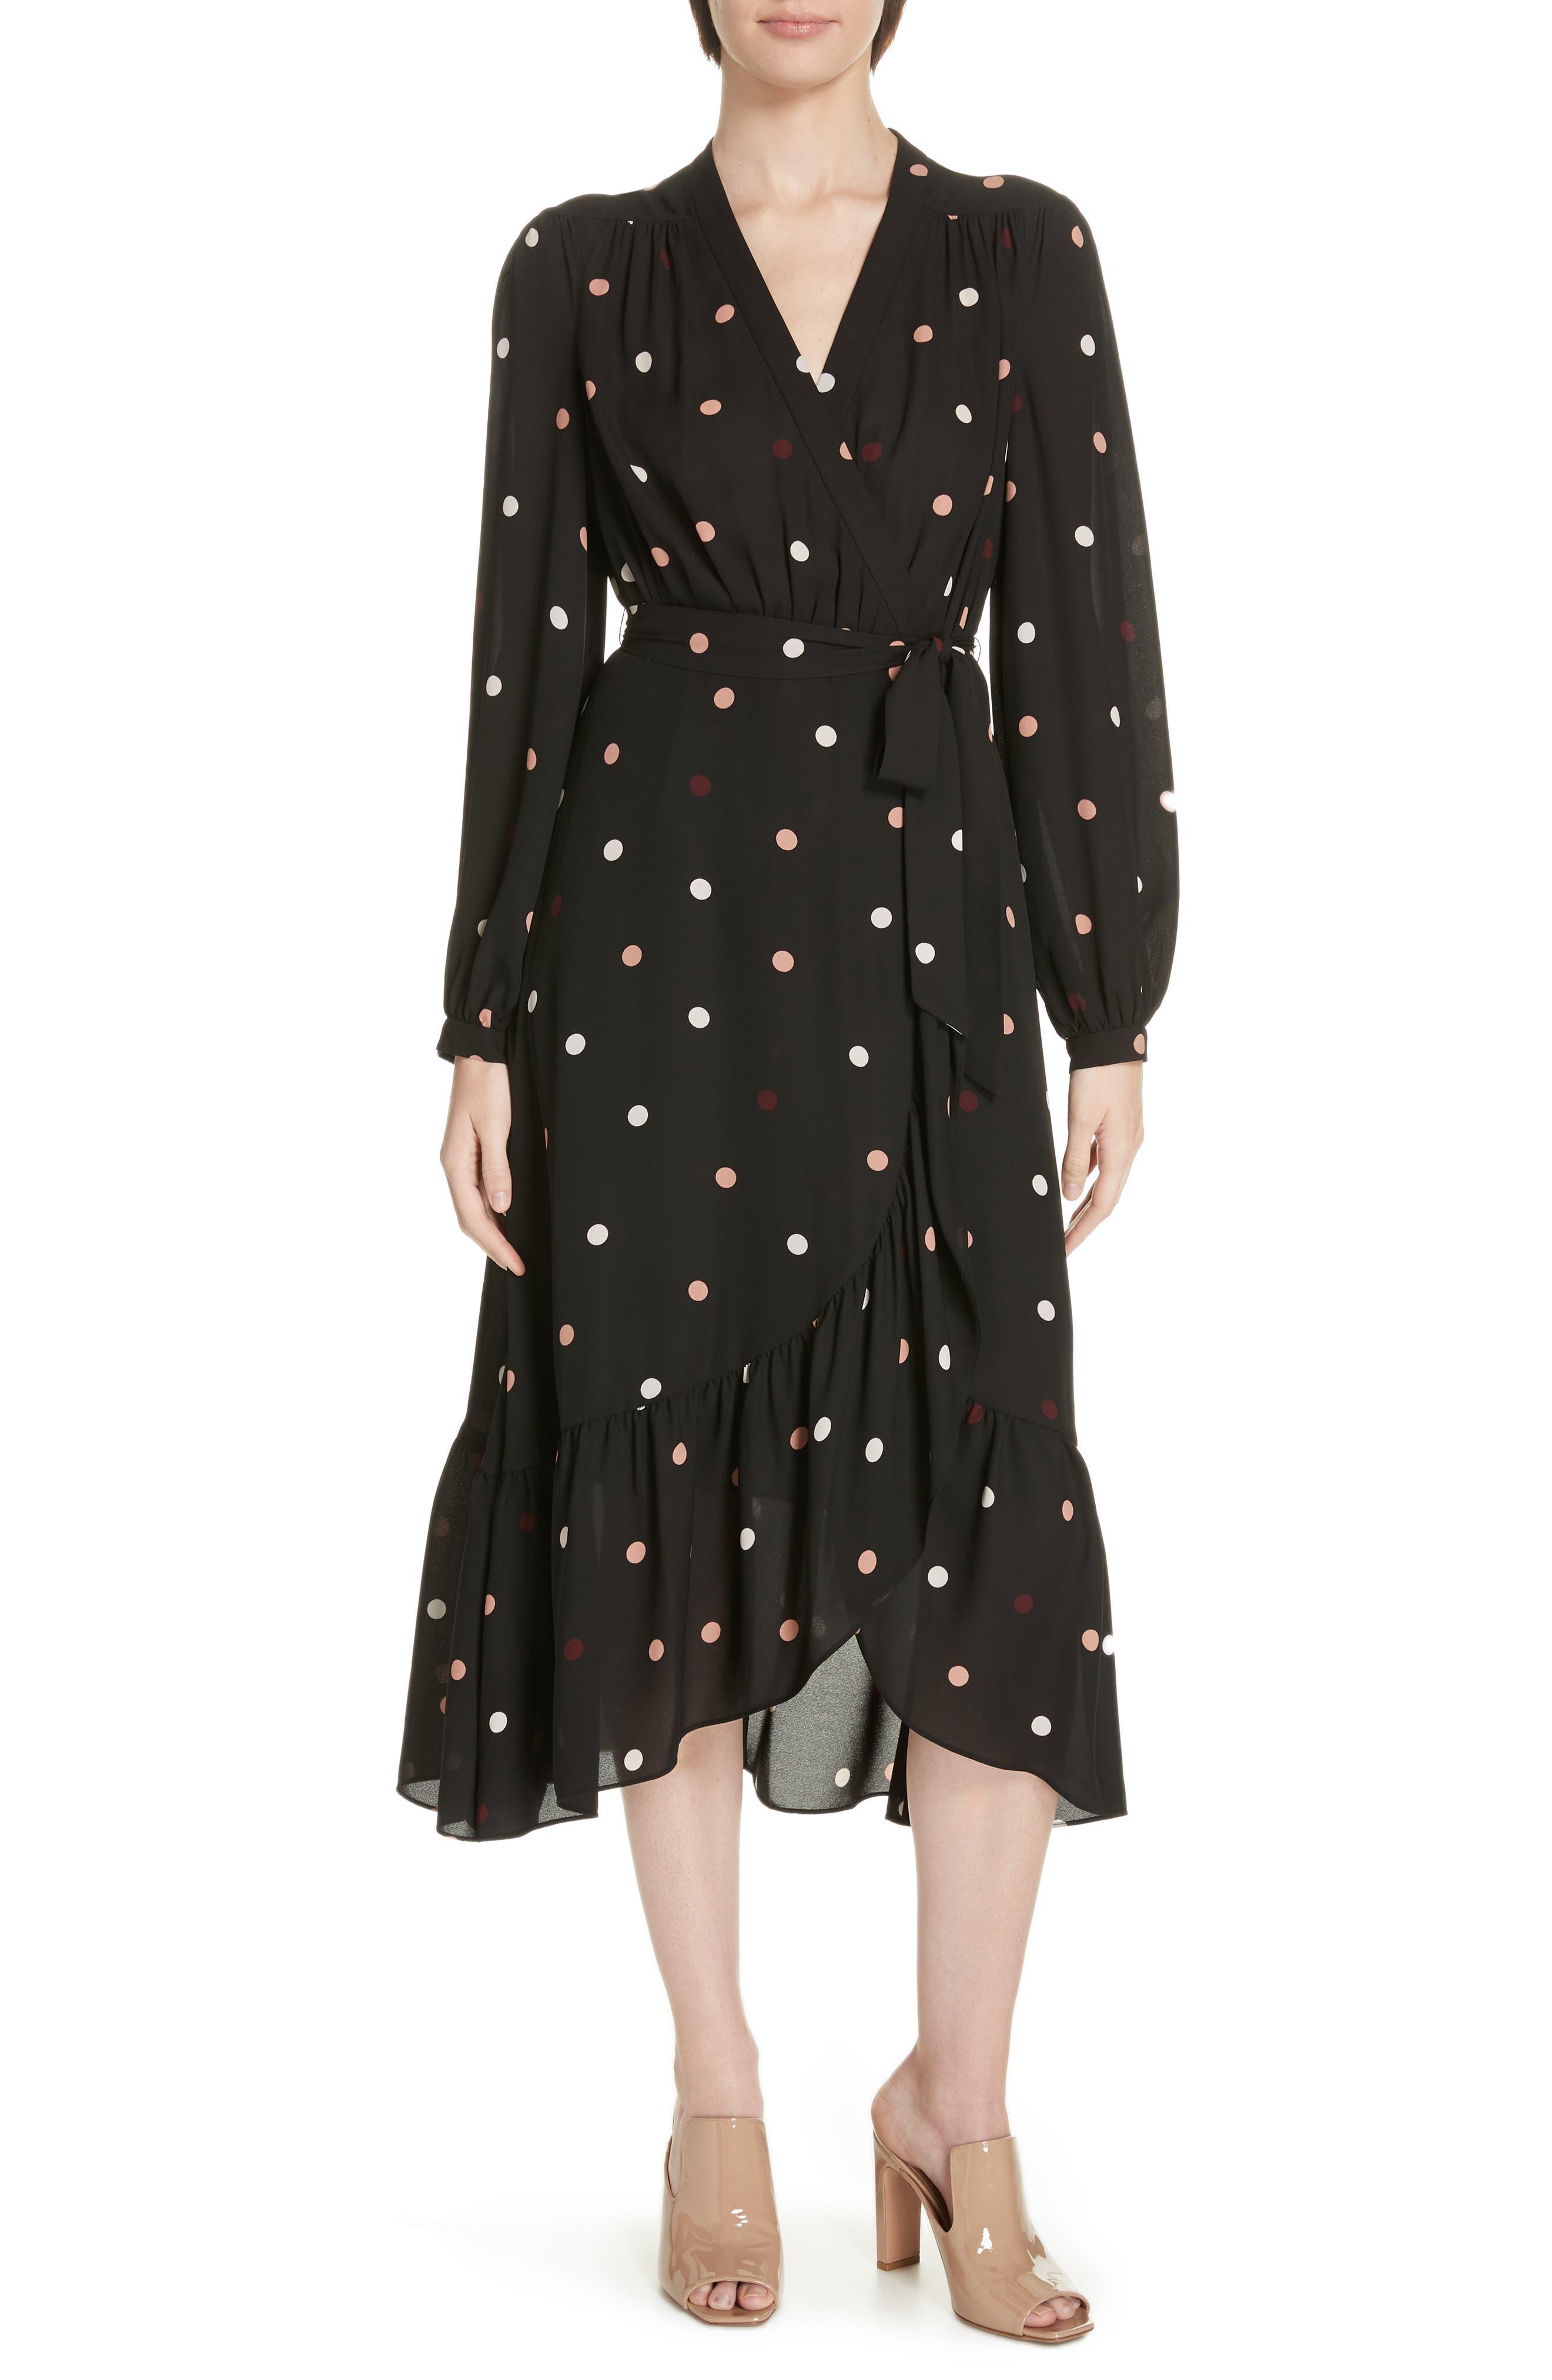 Kate Spade New York Bakery Dot Midi Wrap Dress, Black